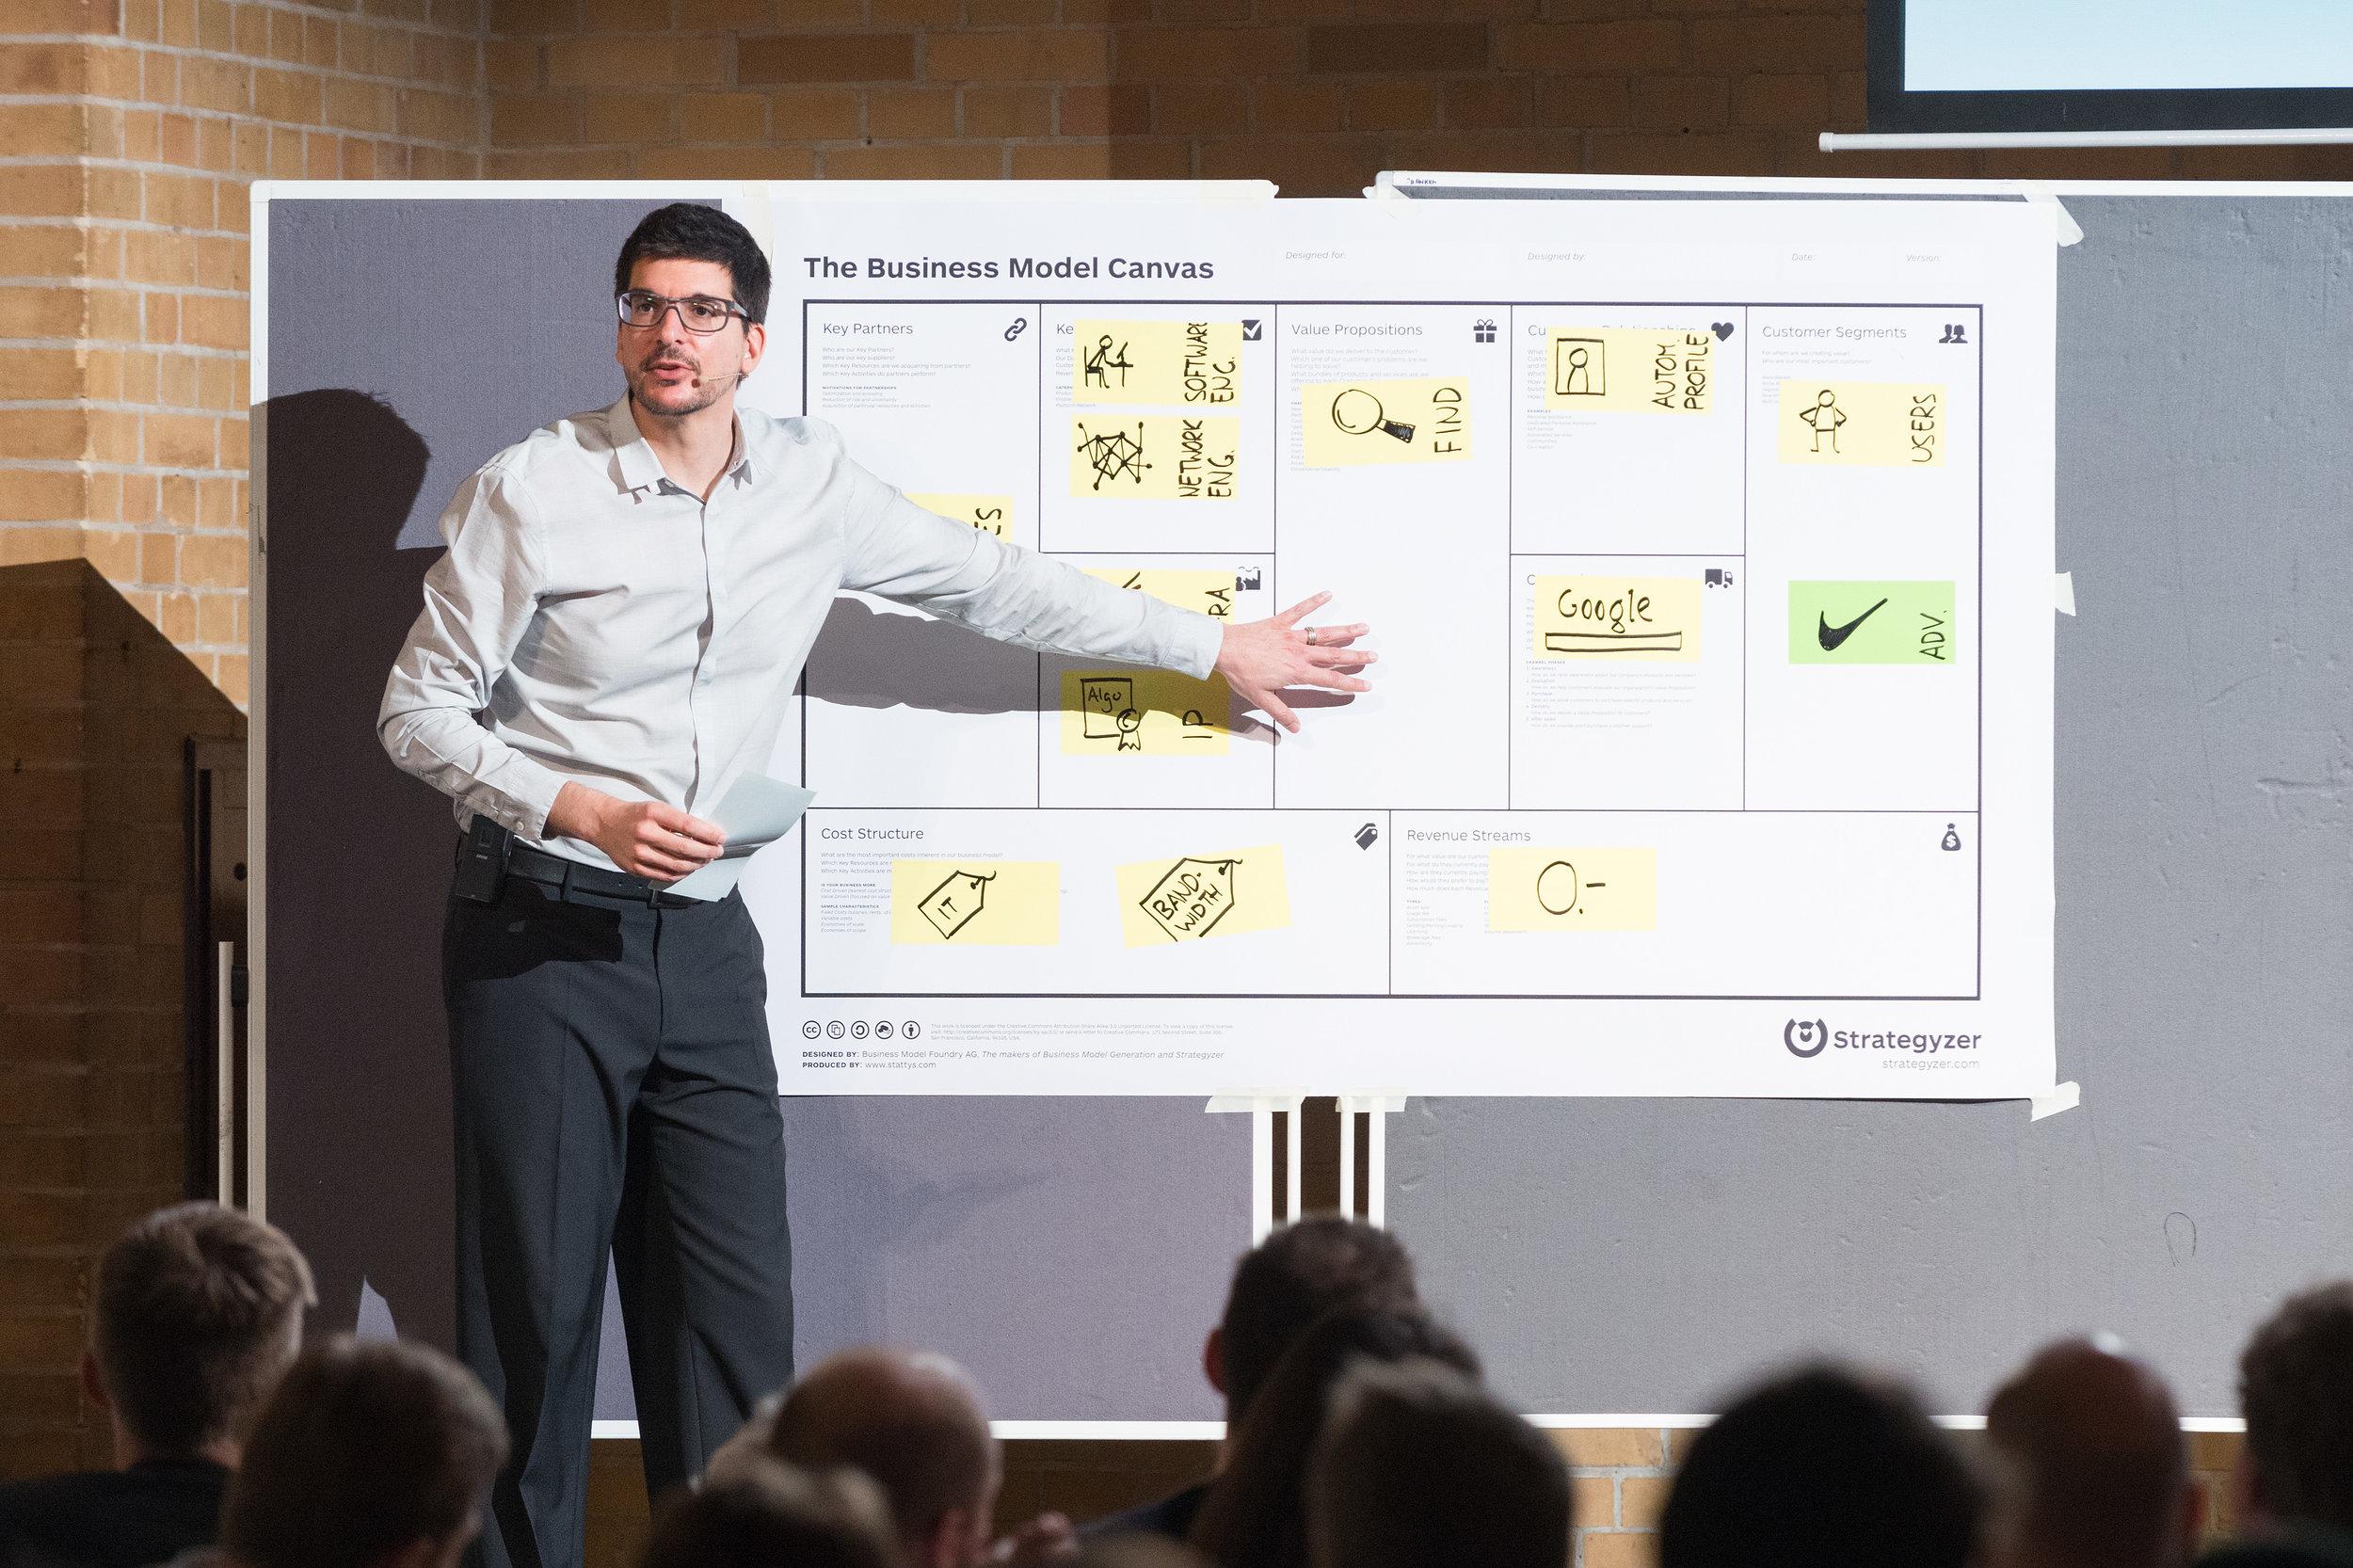 Alex-Osterwalder-Strategyzer-Masterclass-BMC.jpg